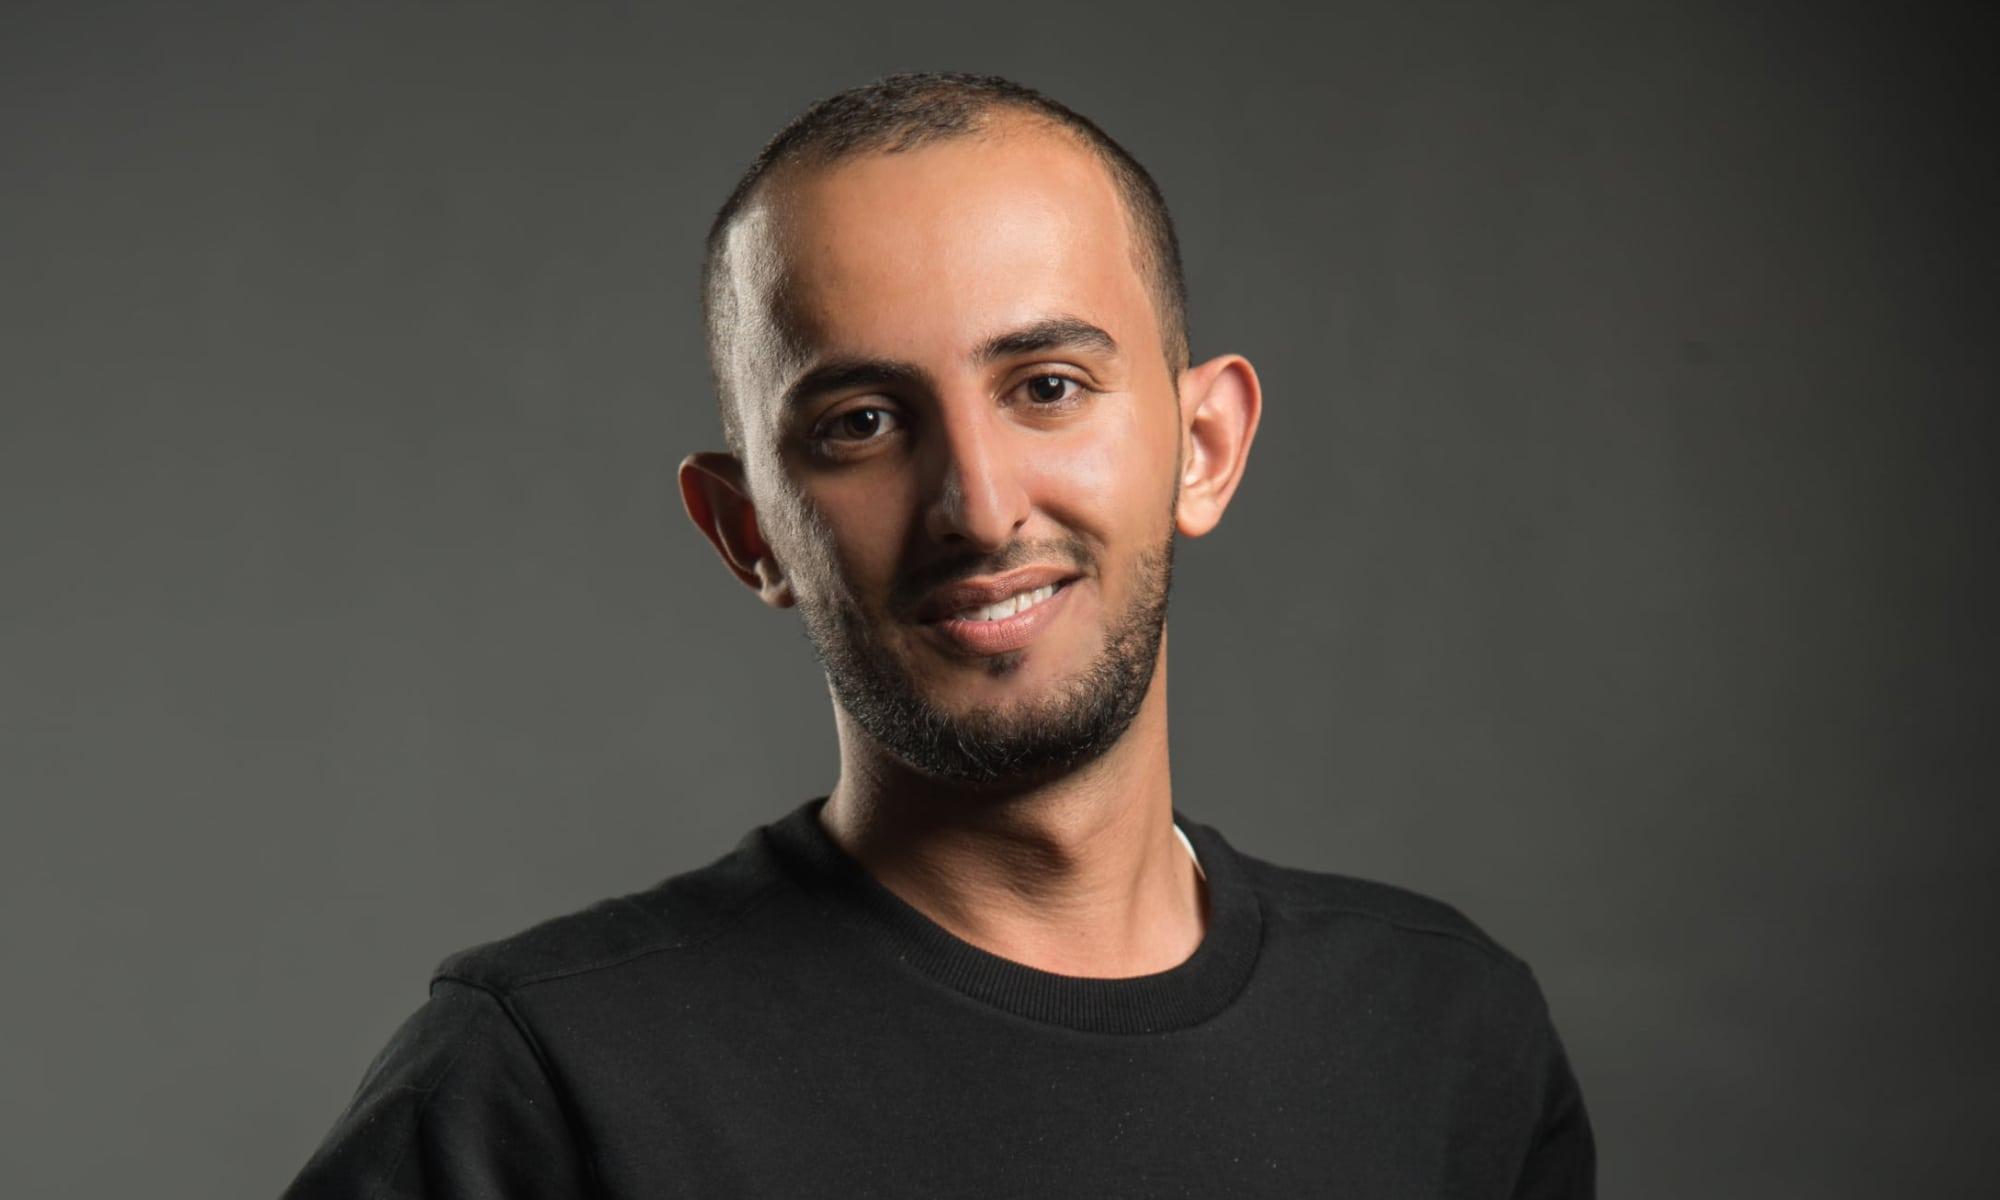 Salah Al-Dhaferi